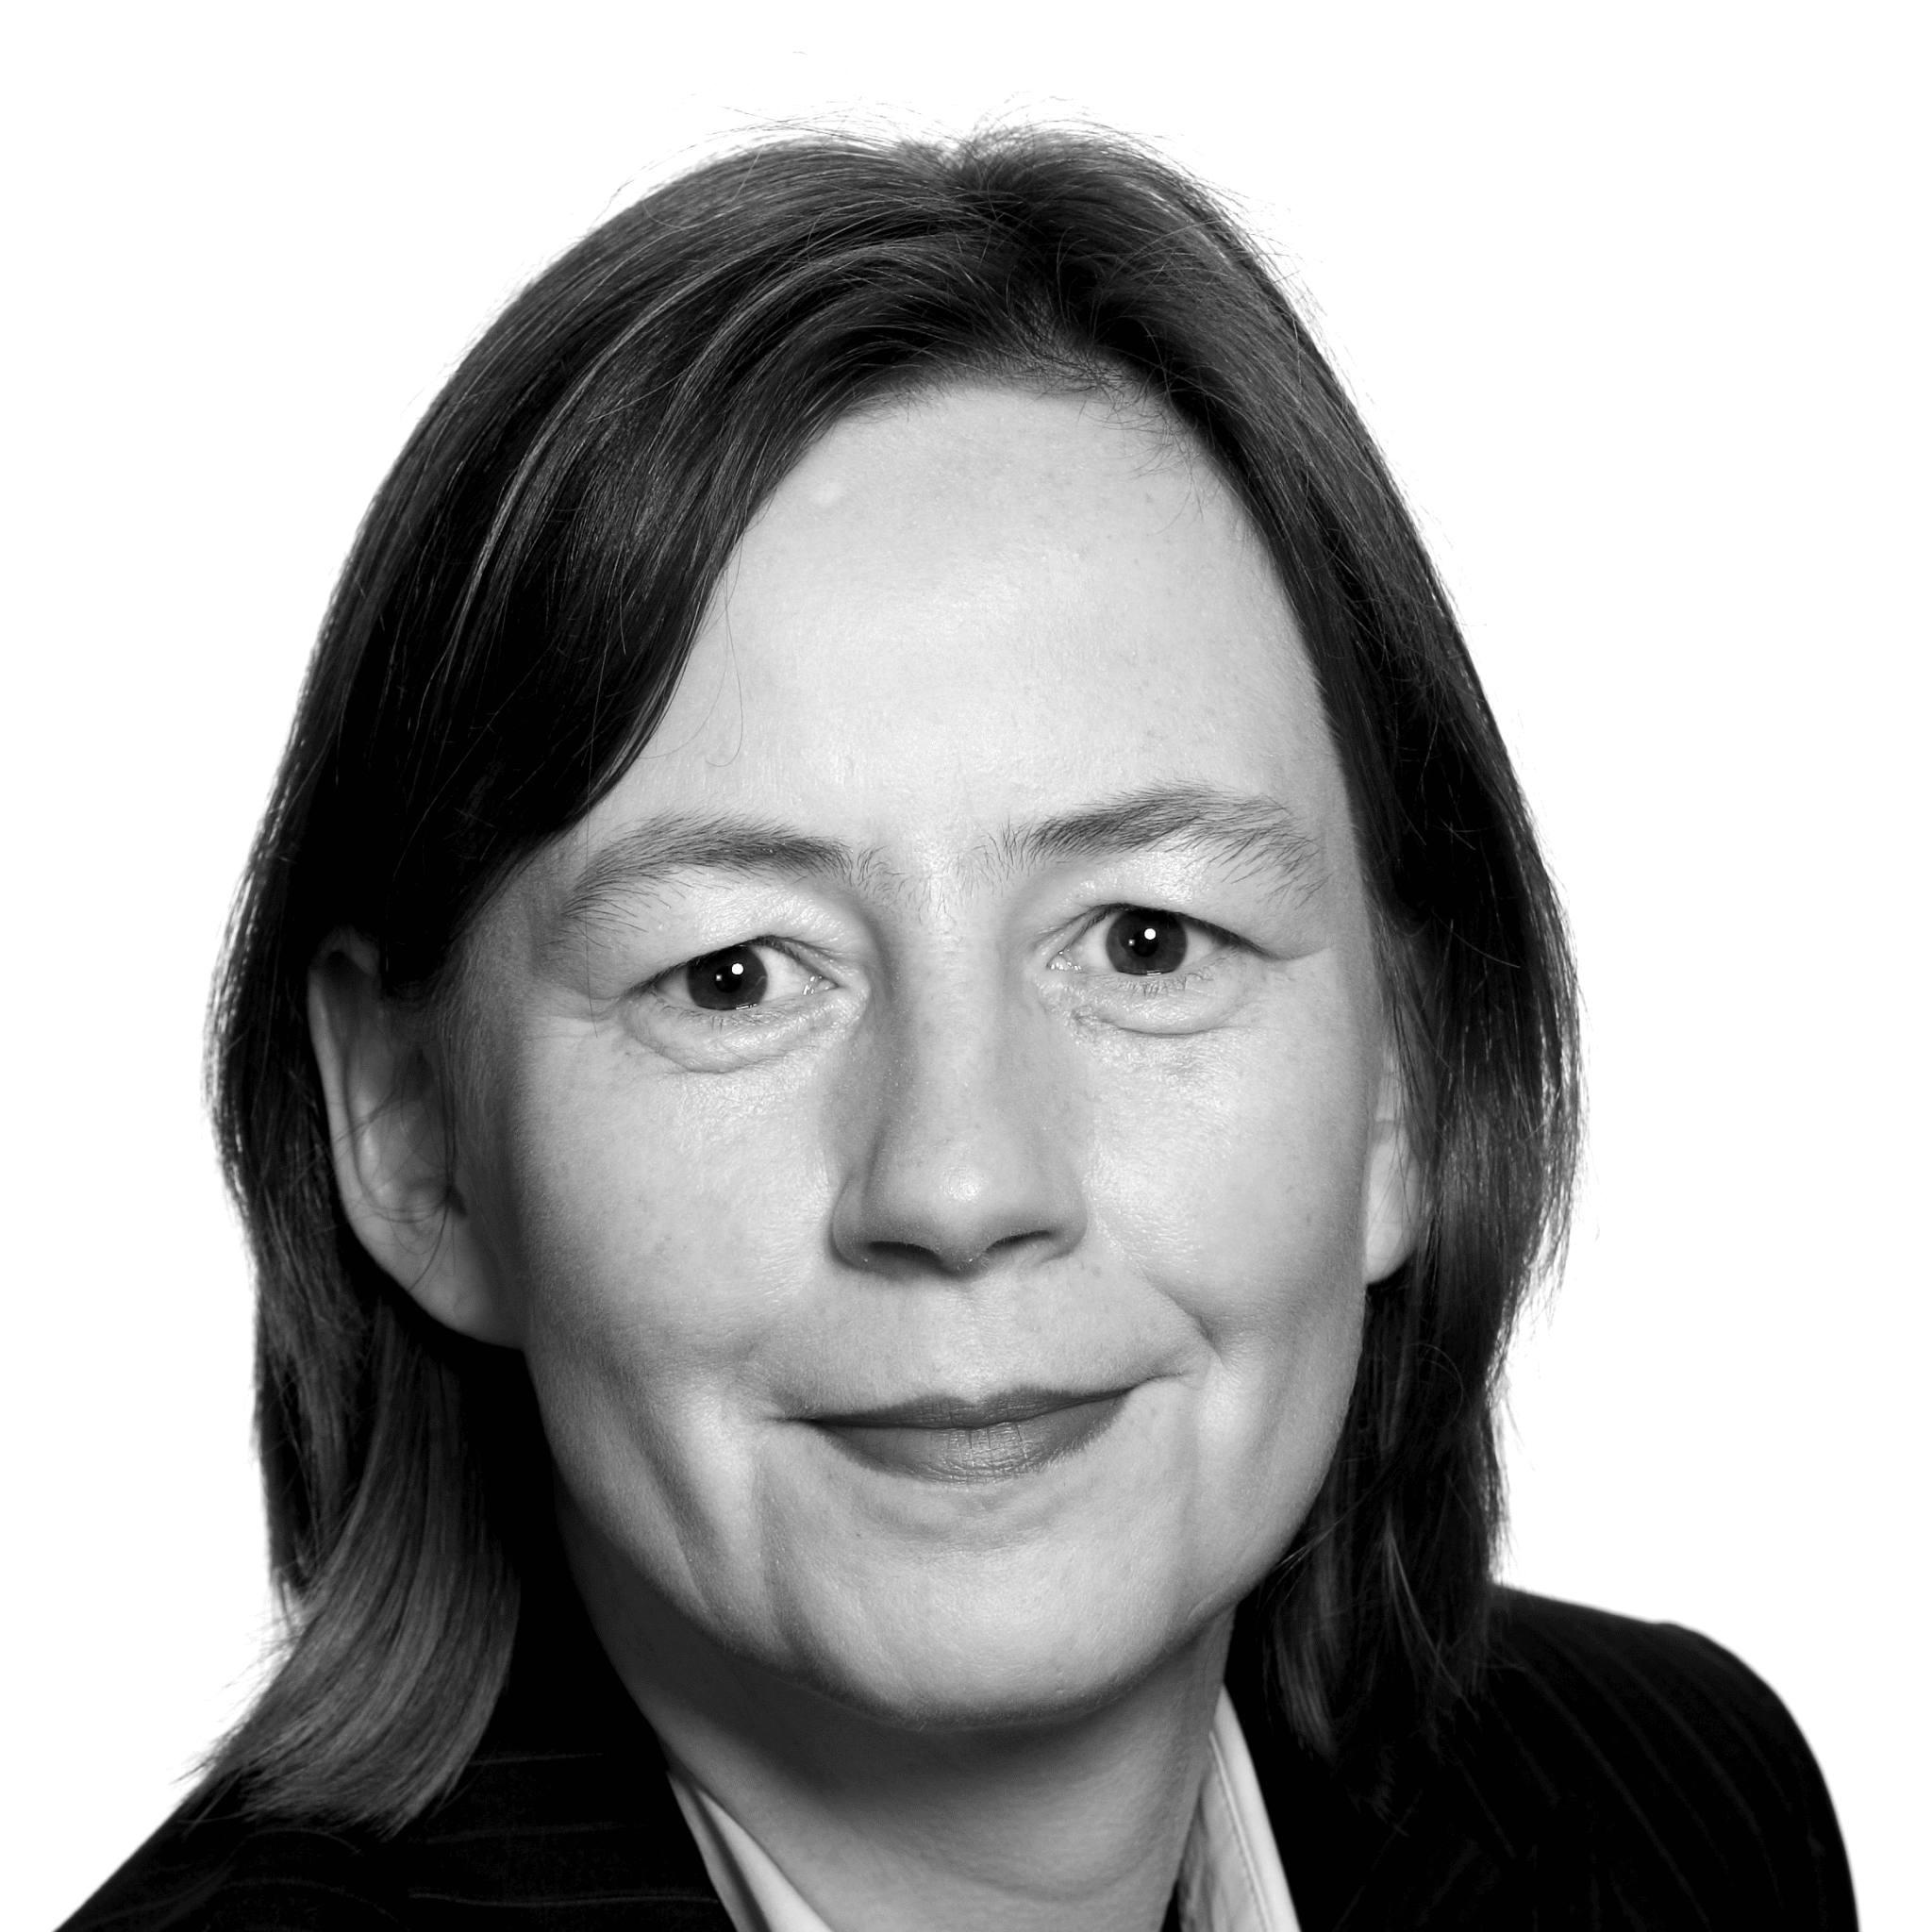 Jost_Margit Kopie